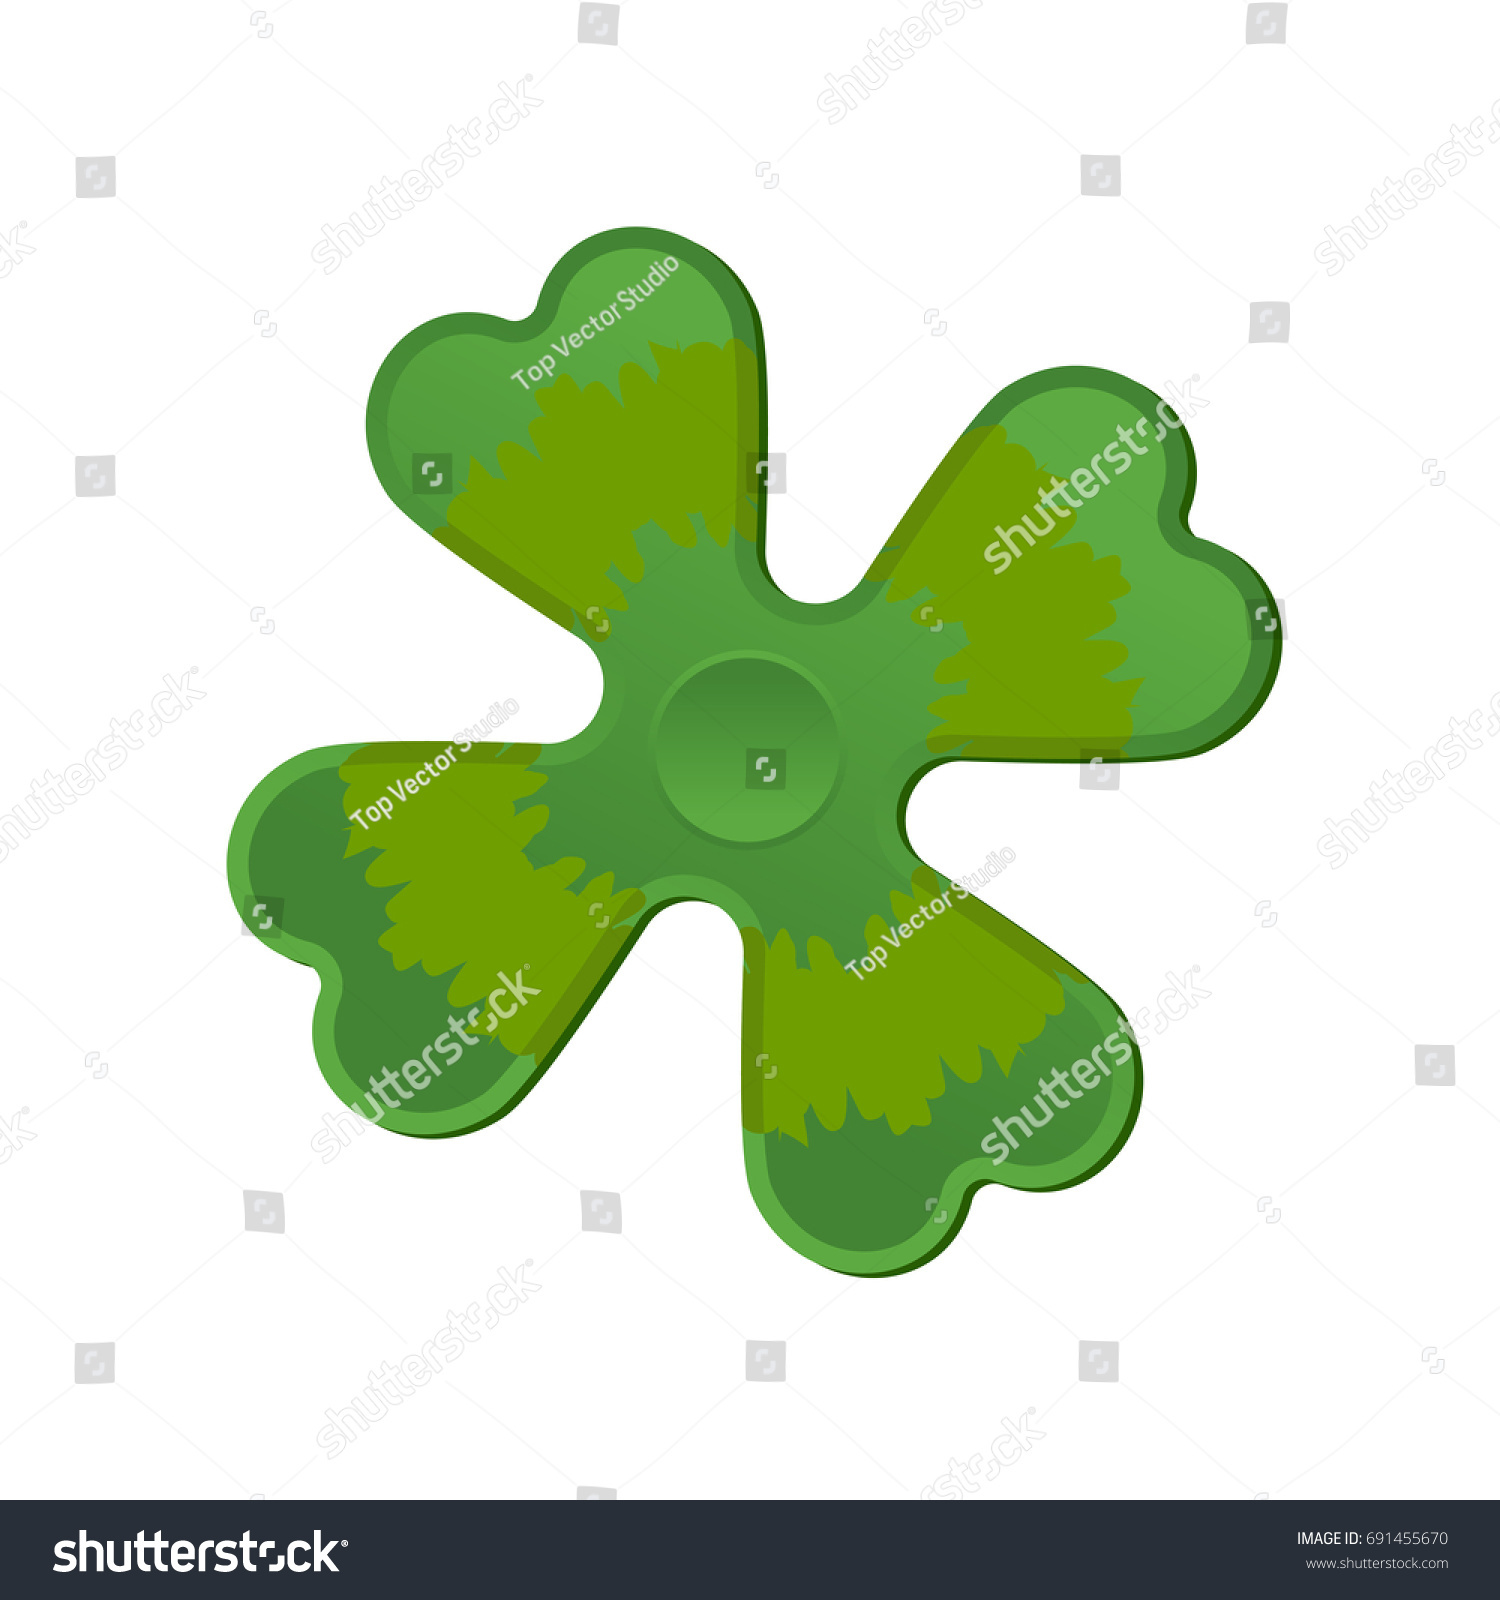 Irish spinner clover shamrock hand toy stock vector 691455670 irish spinner clover shamrock hand toy for ireland green clover fidget finger biocorpaavc Gallery